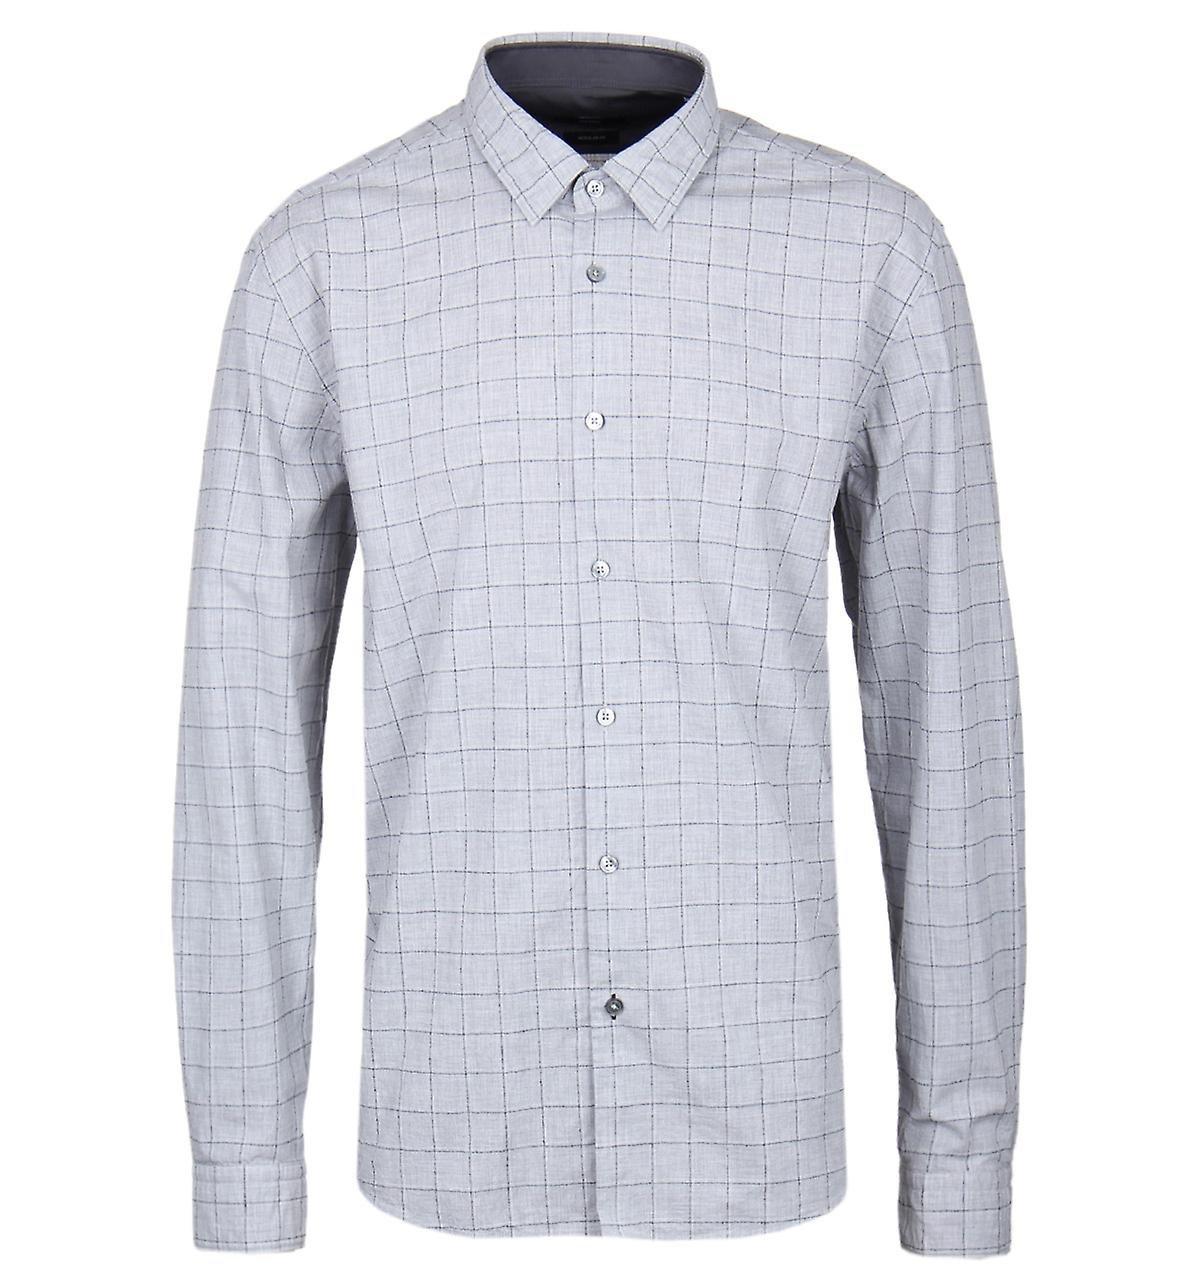 Hugo Boss Men's Trim Fit Lance Grey Melange Short Length Shirt - XL